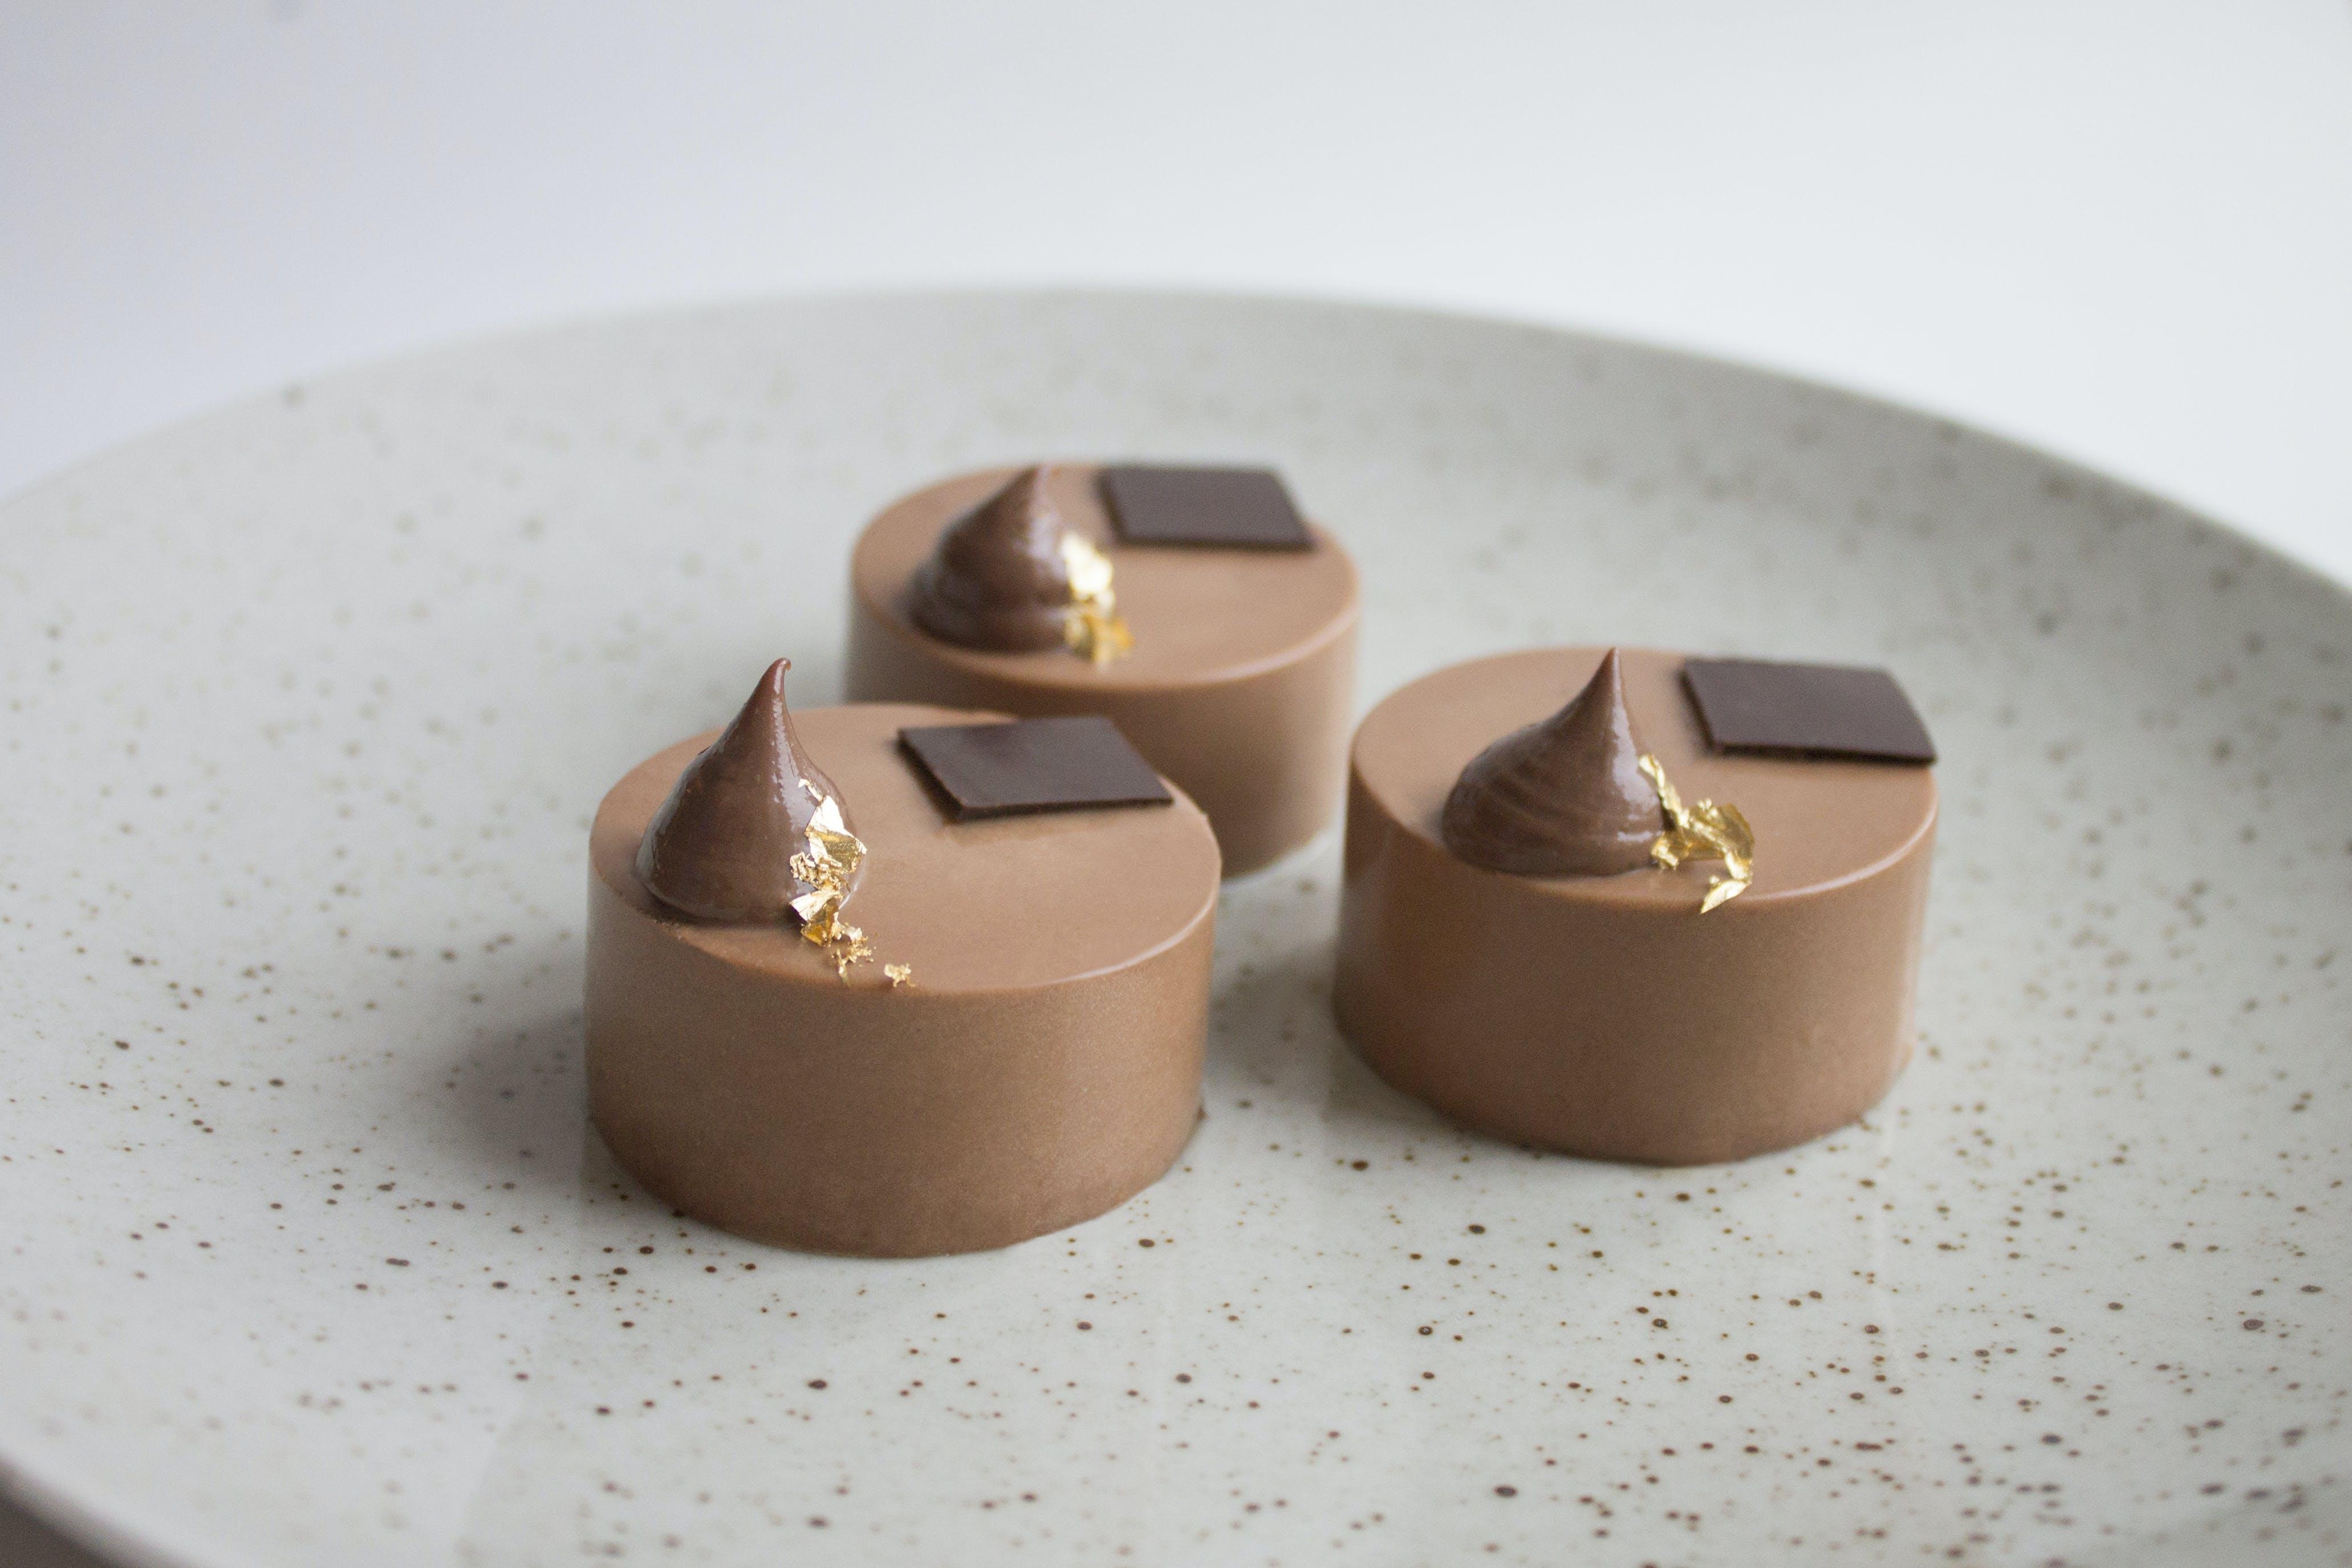 chokoladekage brownie ganache peanut